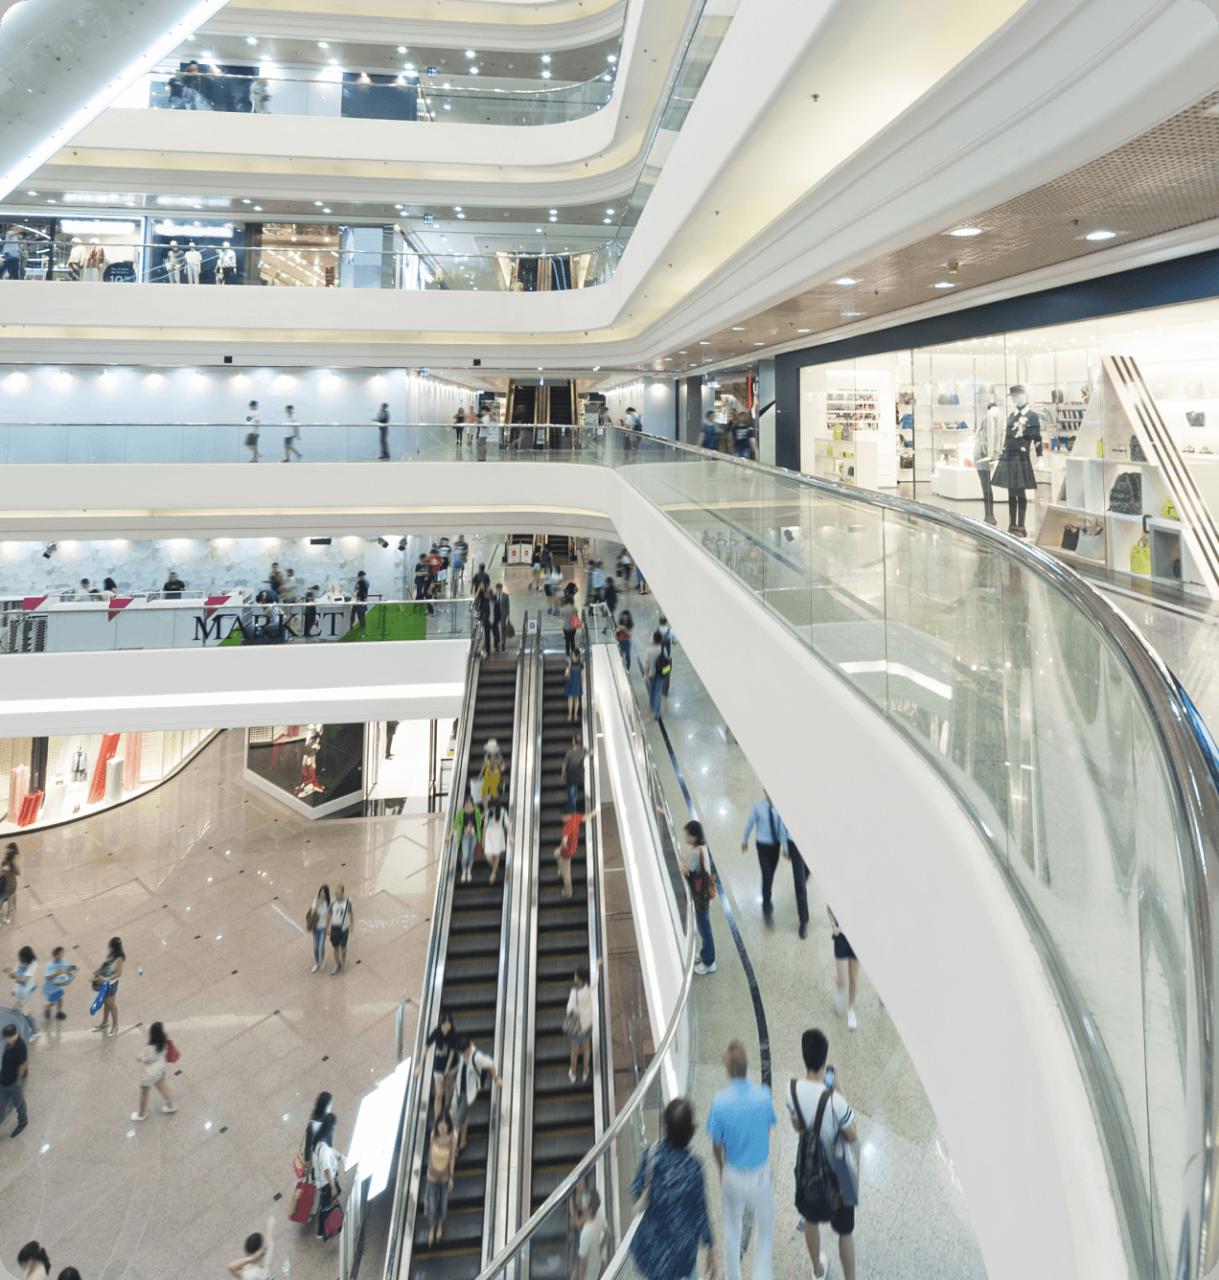 Inside a shopping mall